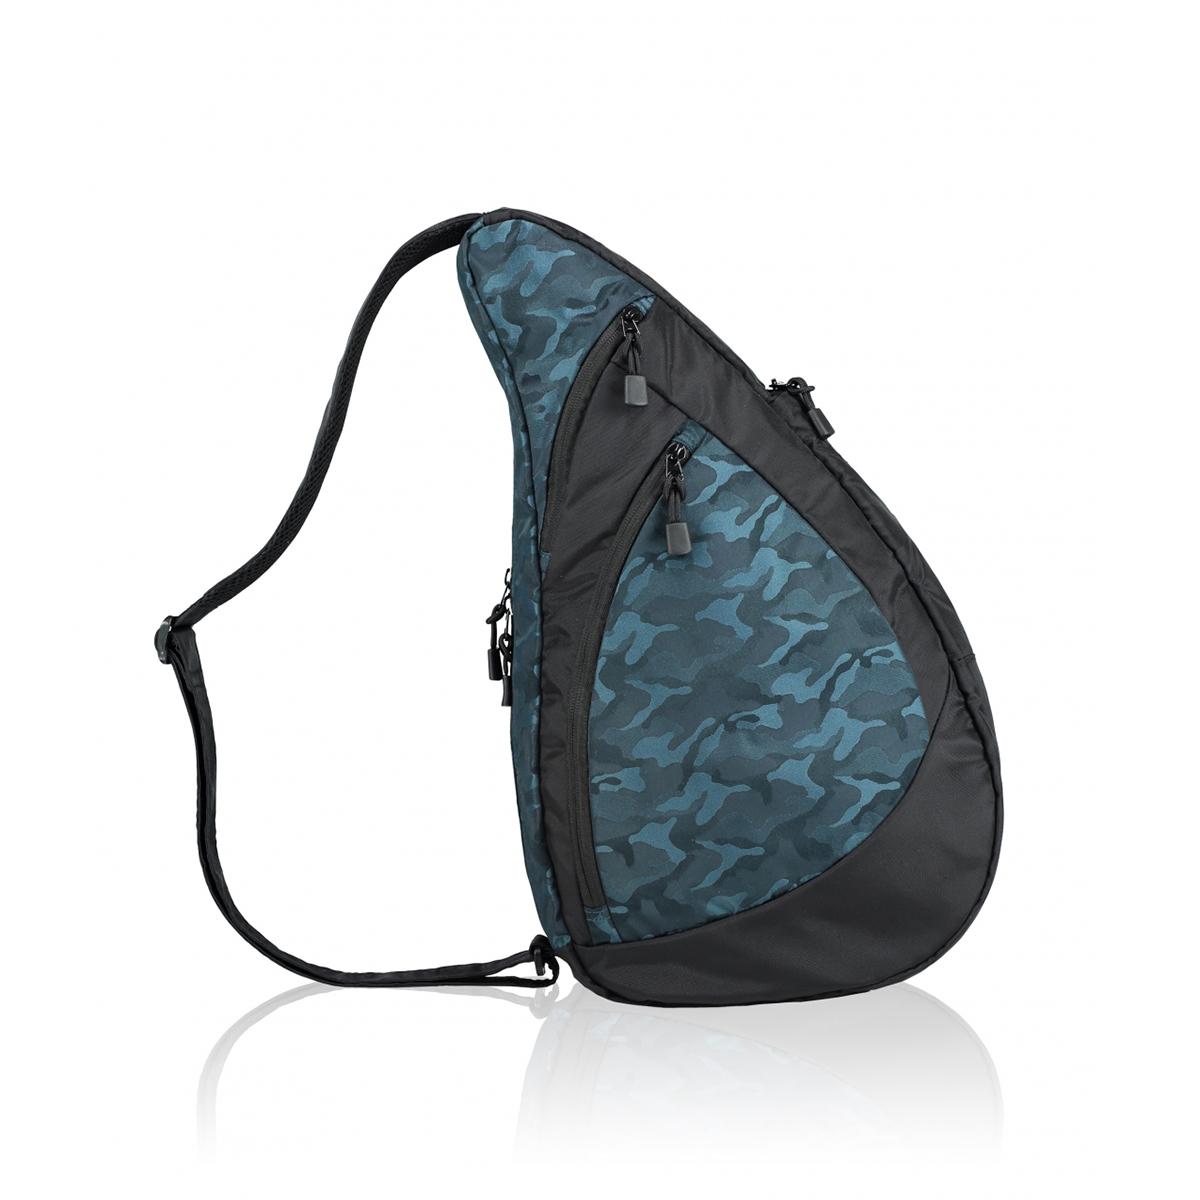 Healthy Back Bag/ヘルシーバックバッグ/ショルダーバッグ/ボディバッグ/旅行バッグ/軽量/レディース/メンズ 公式ストア 公式ストア ヘルシーバックバッグ アウトドアエレメンツ Mサイズ ラグーン